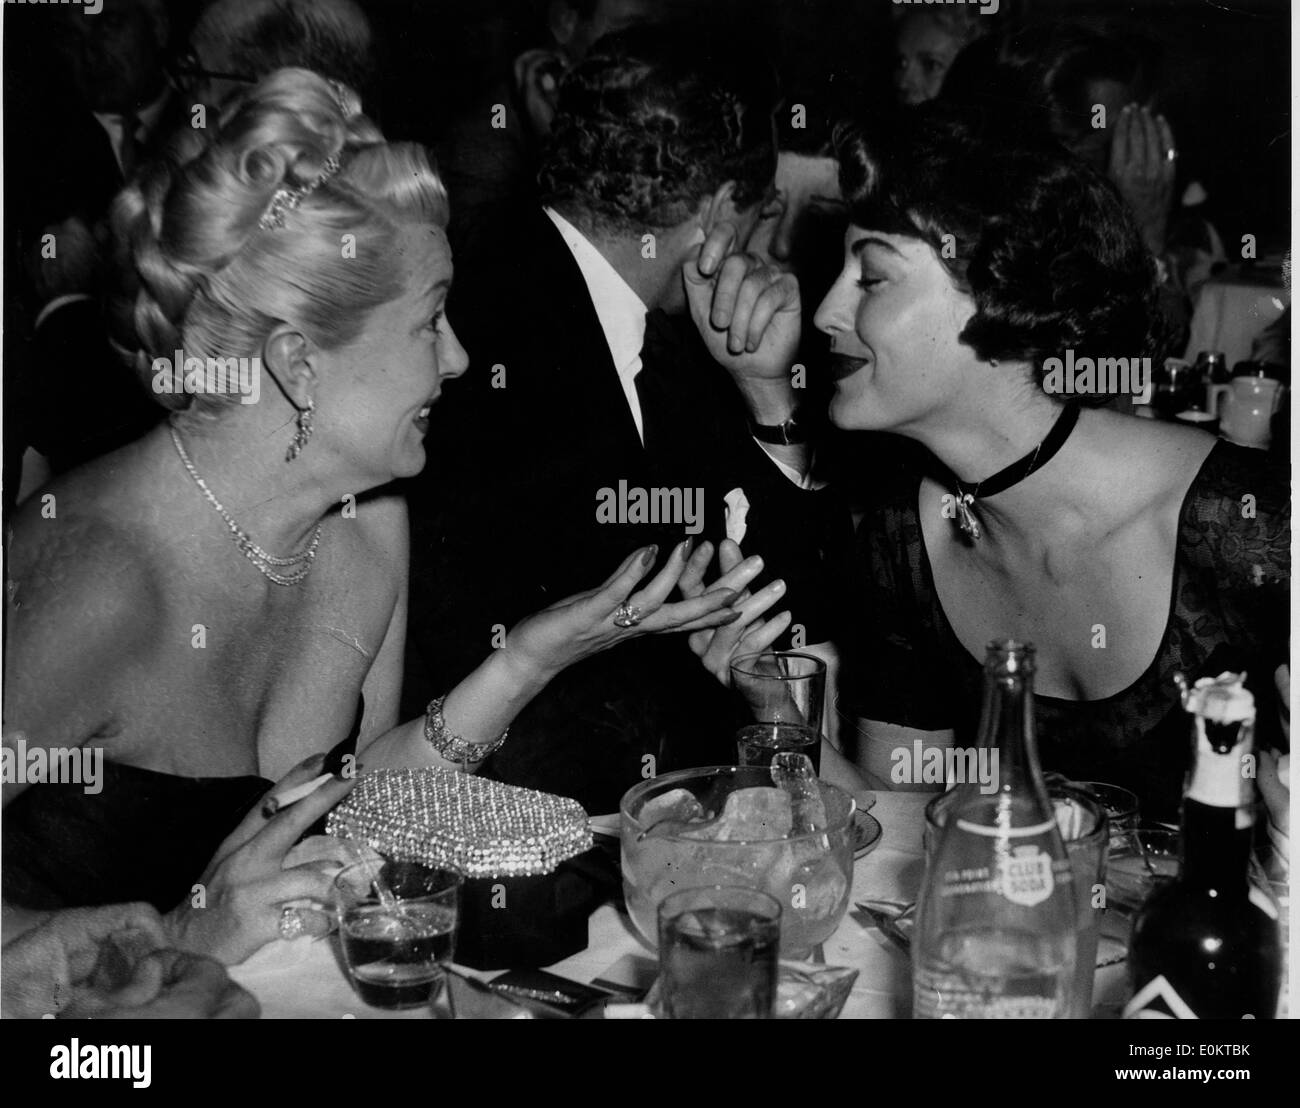 Actresses Lana Turner and Ava Gardner at the Mocambo - Stock Image